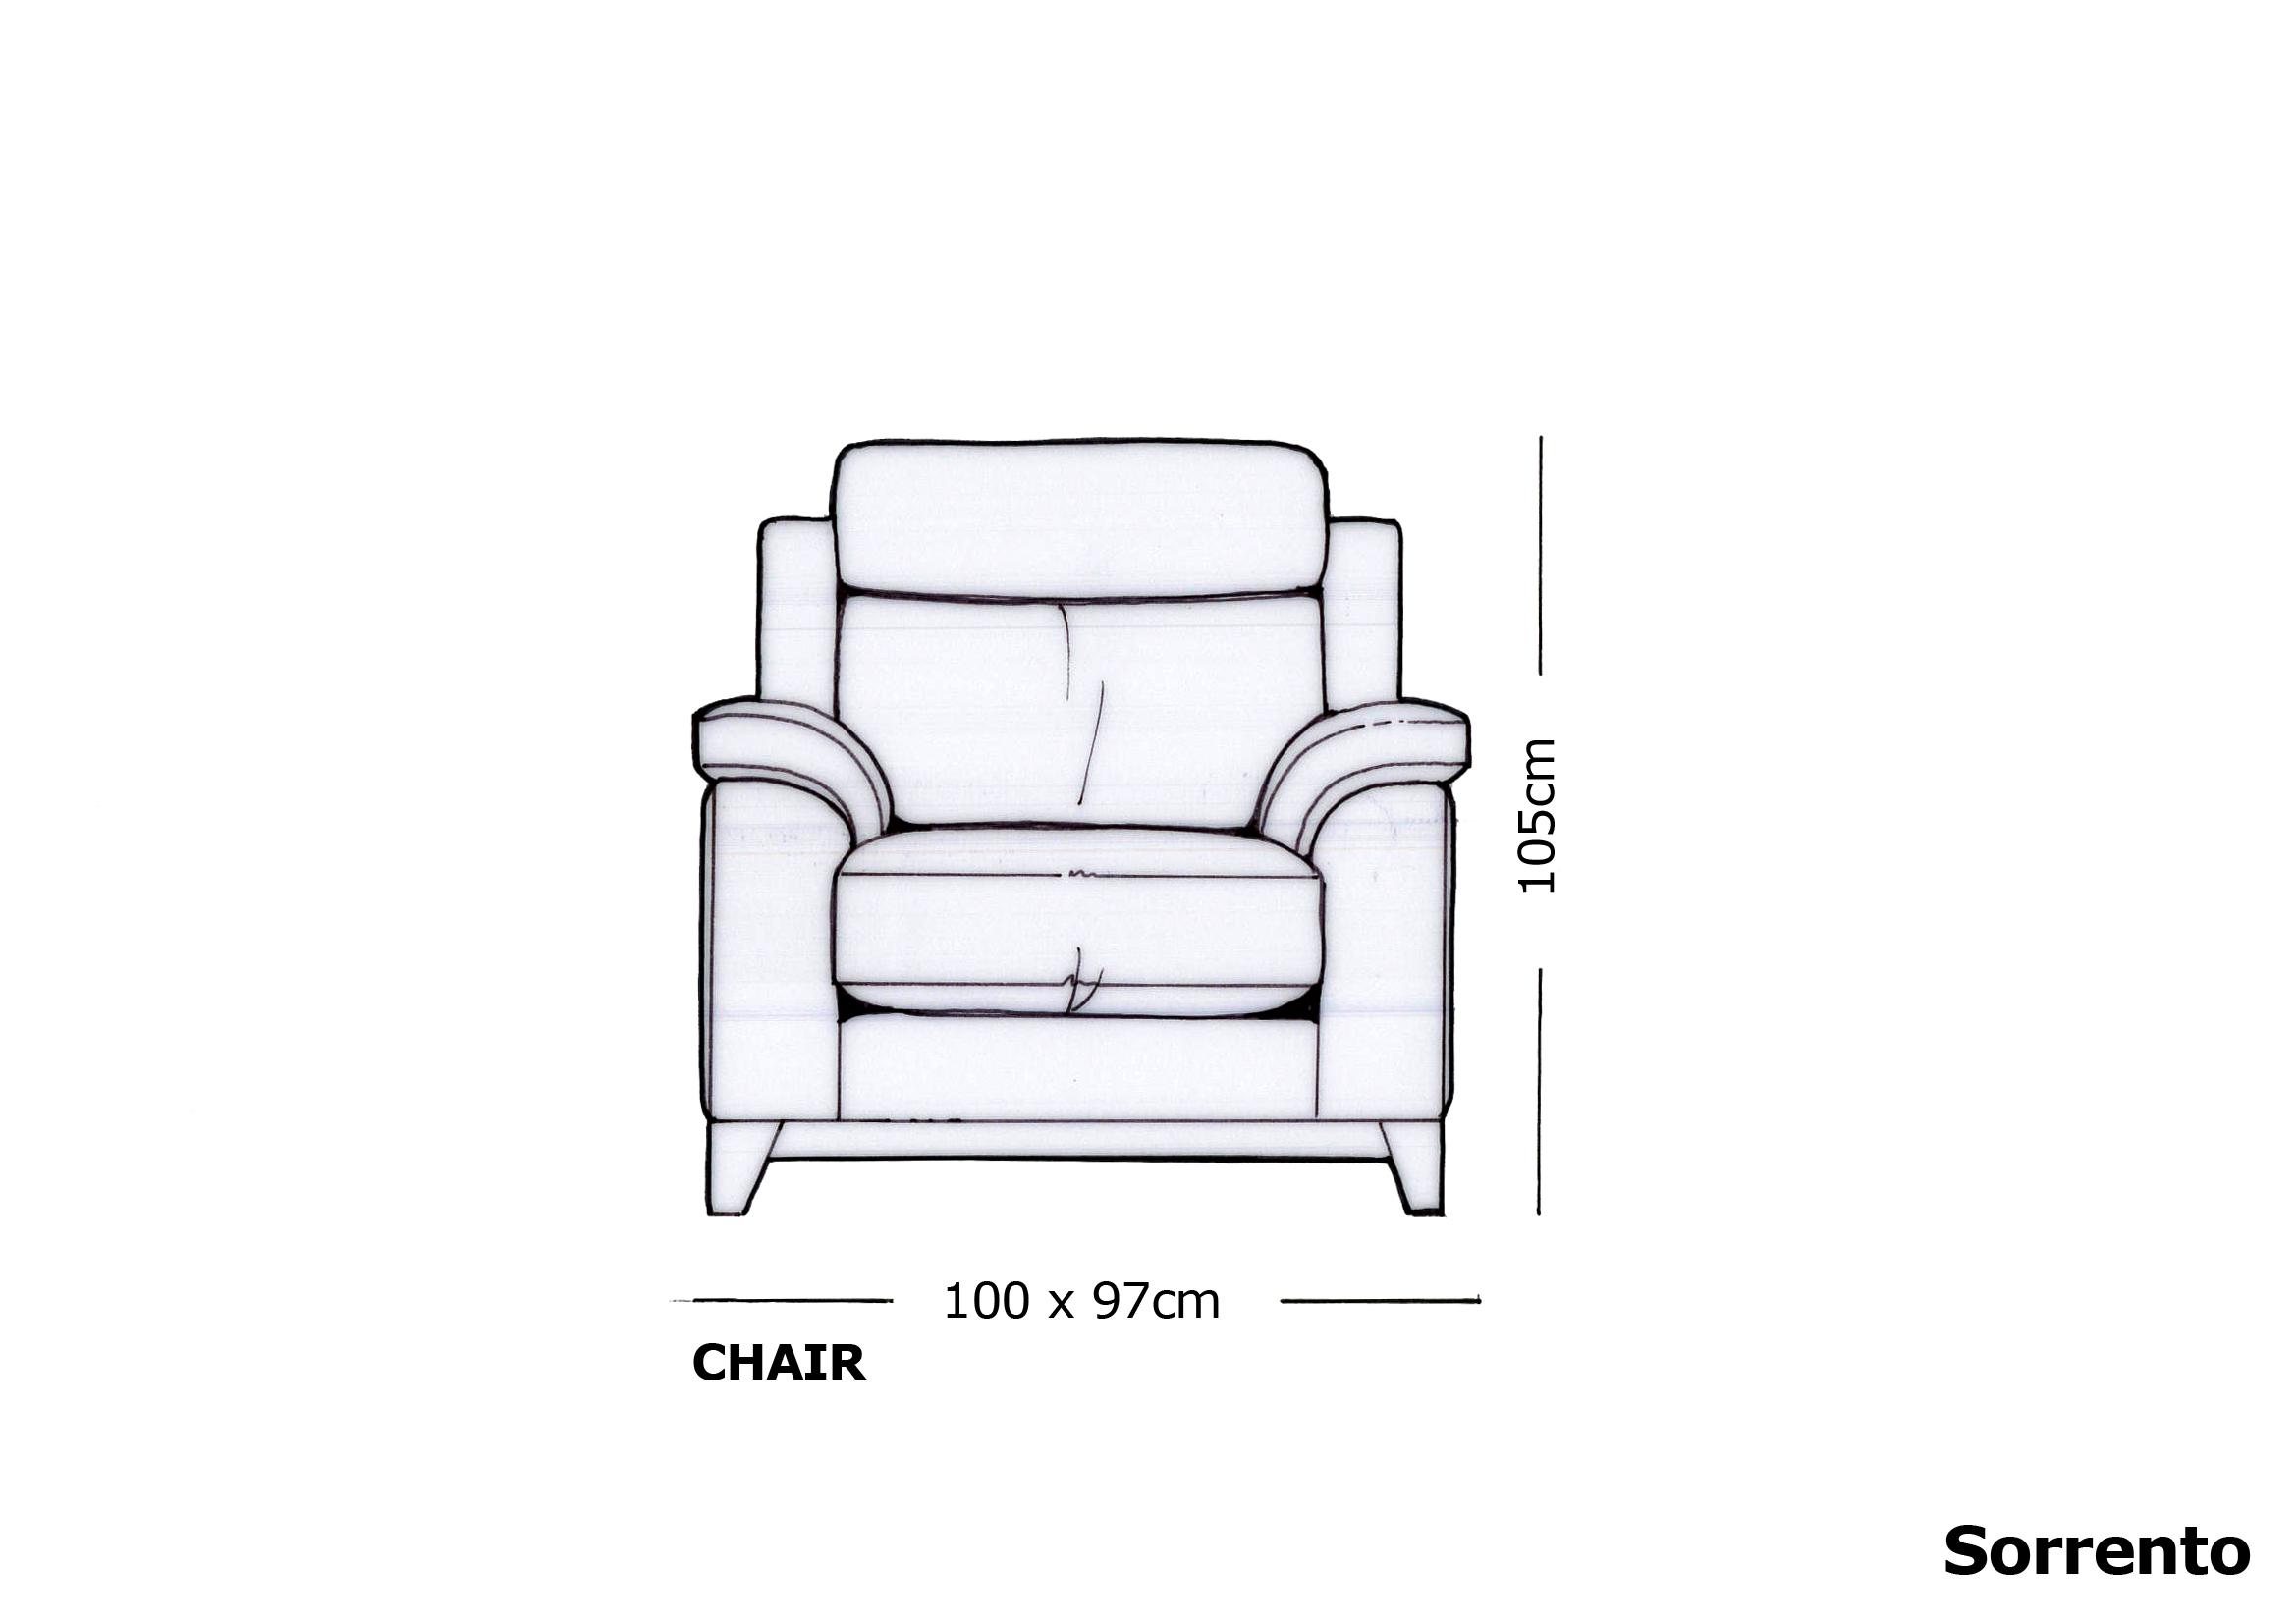 Sorrento Chair Dimensions.jpg